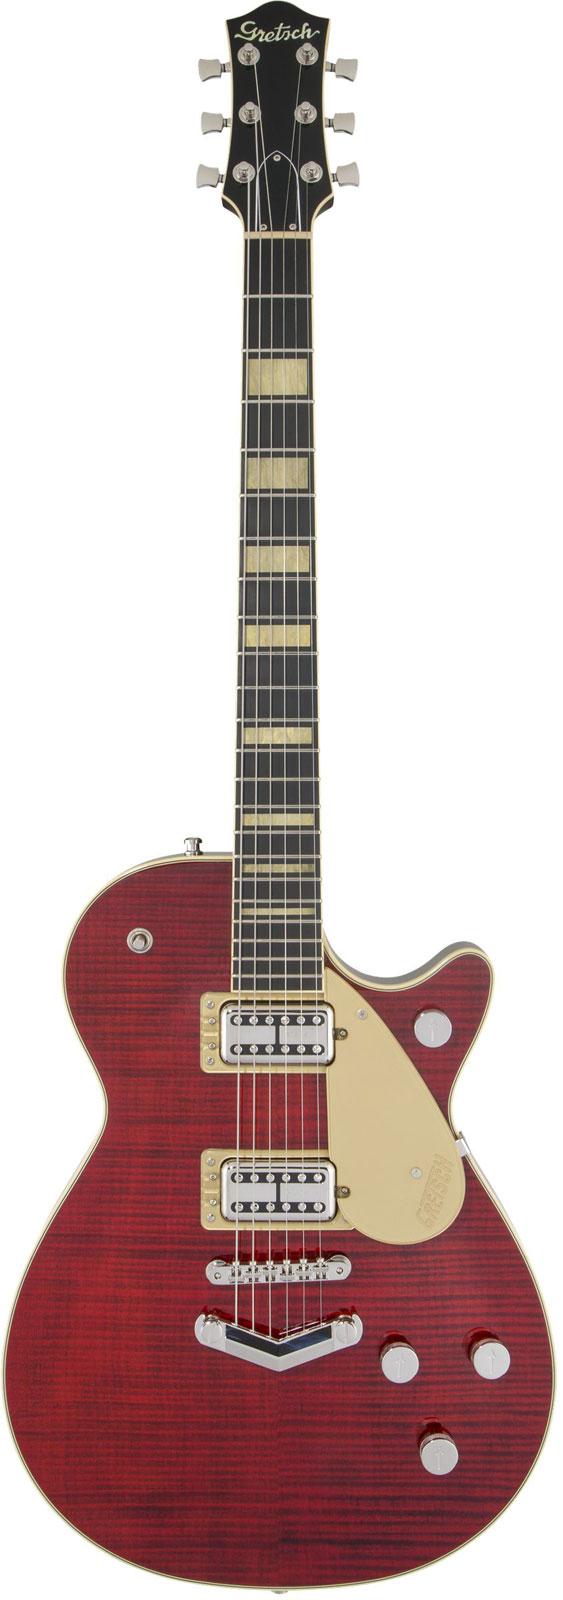 Gretsch Guitars G6228fm-pe-crm Jet Bt Crm Wc